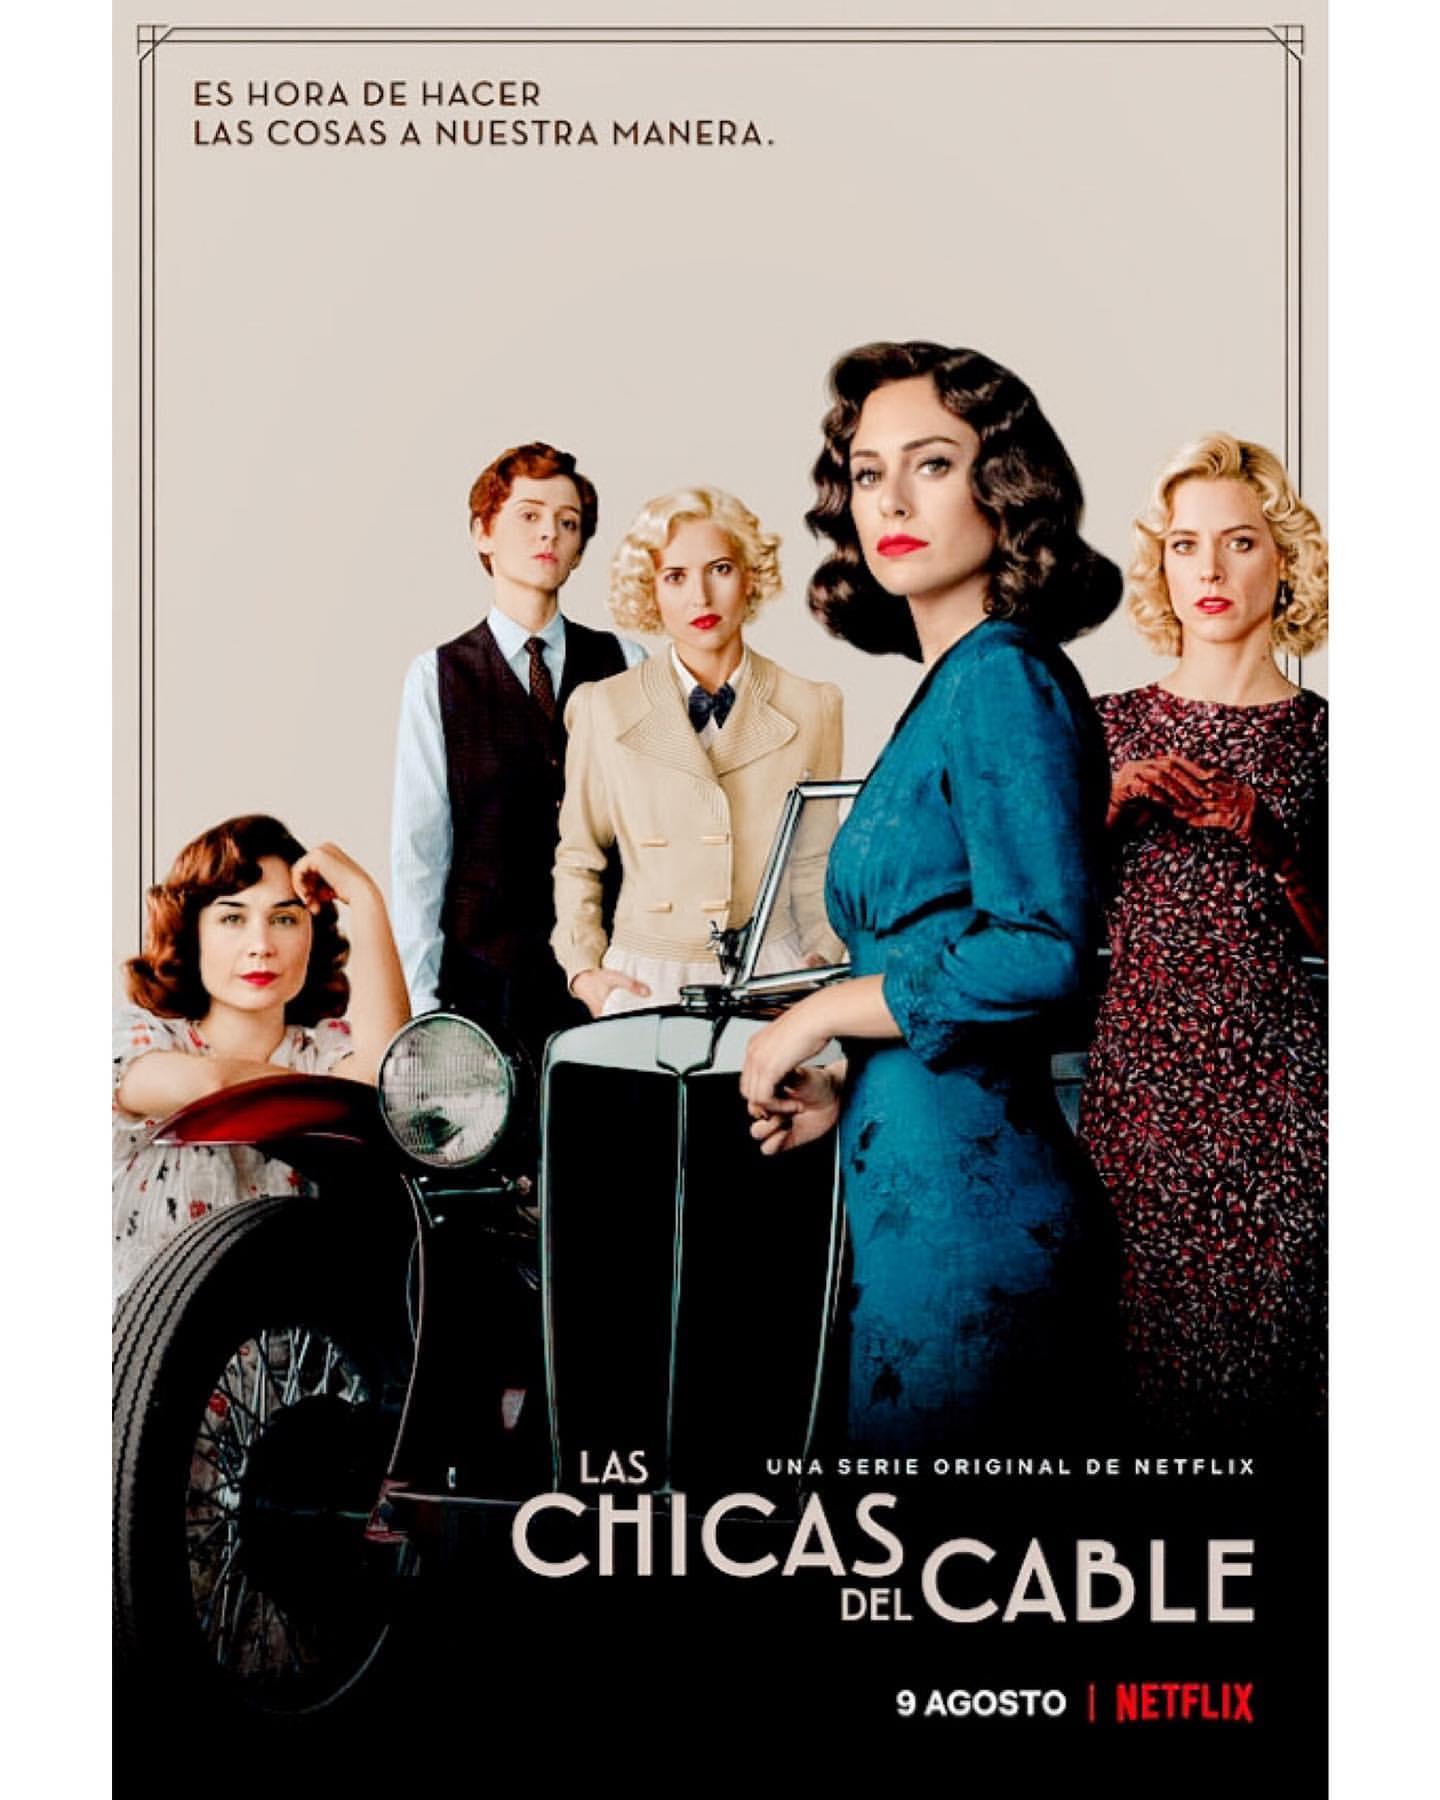 Las chicas del cable 4x01 / Телефонистки 4х01 (2019)